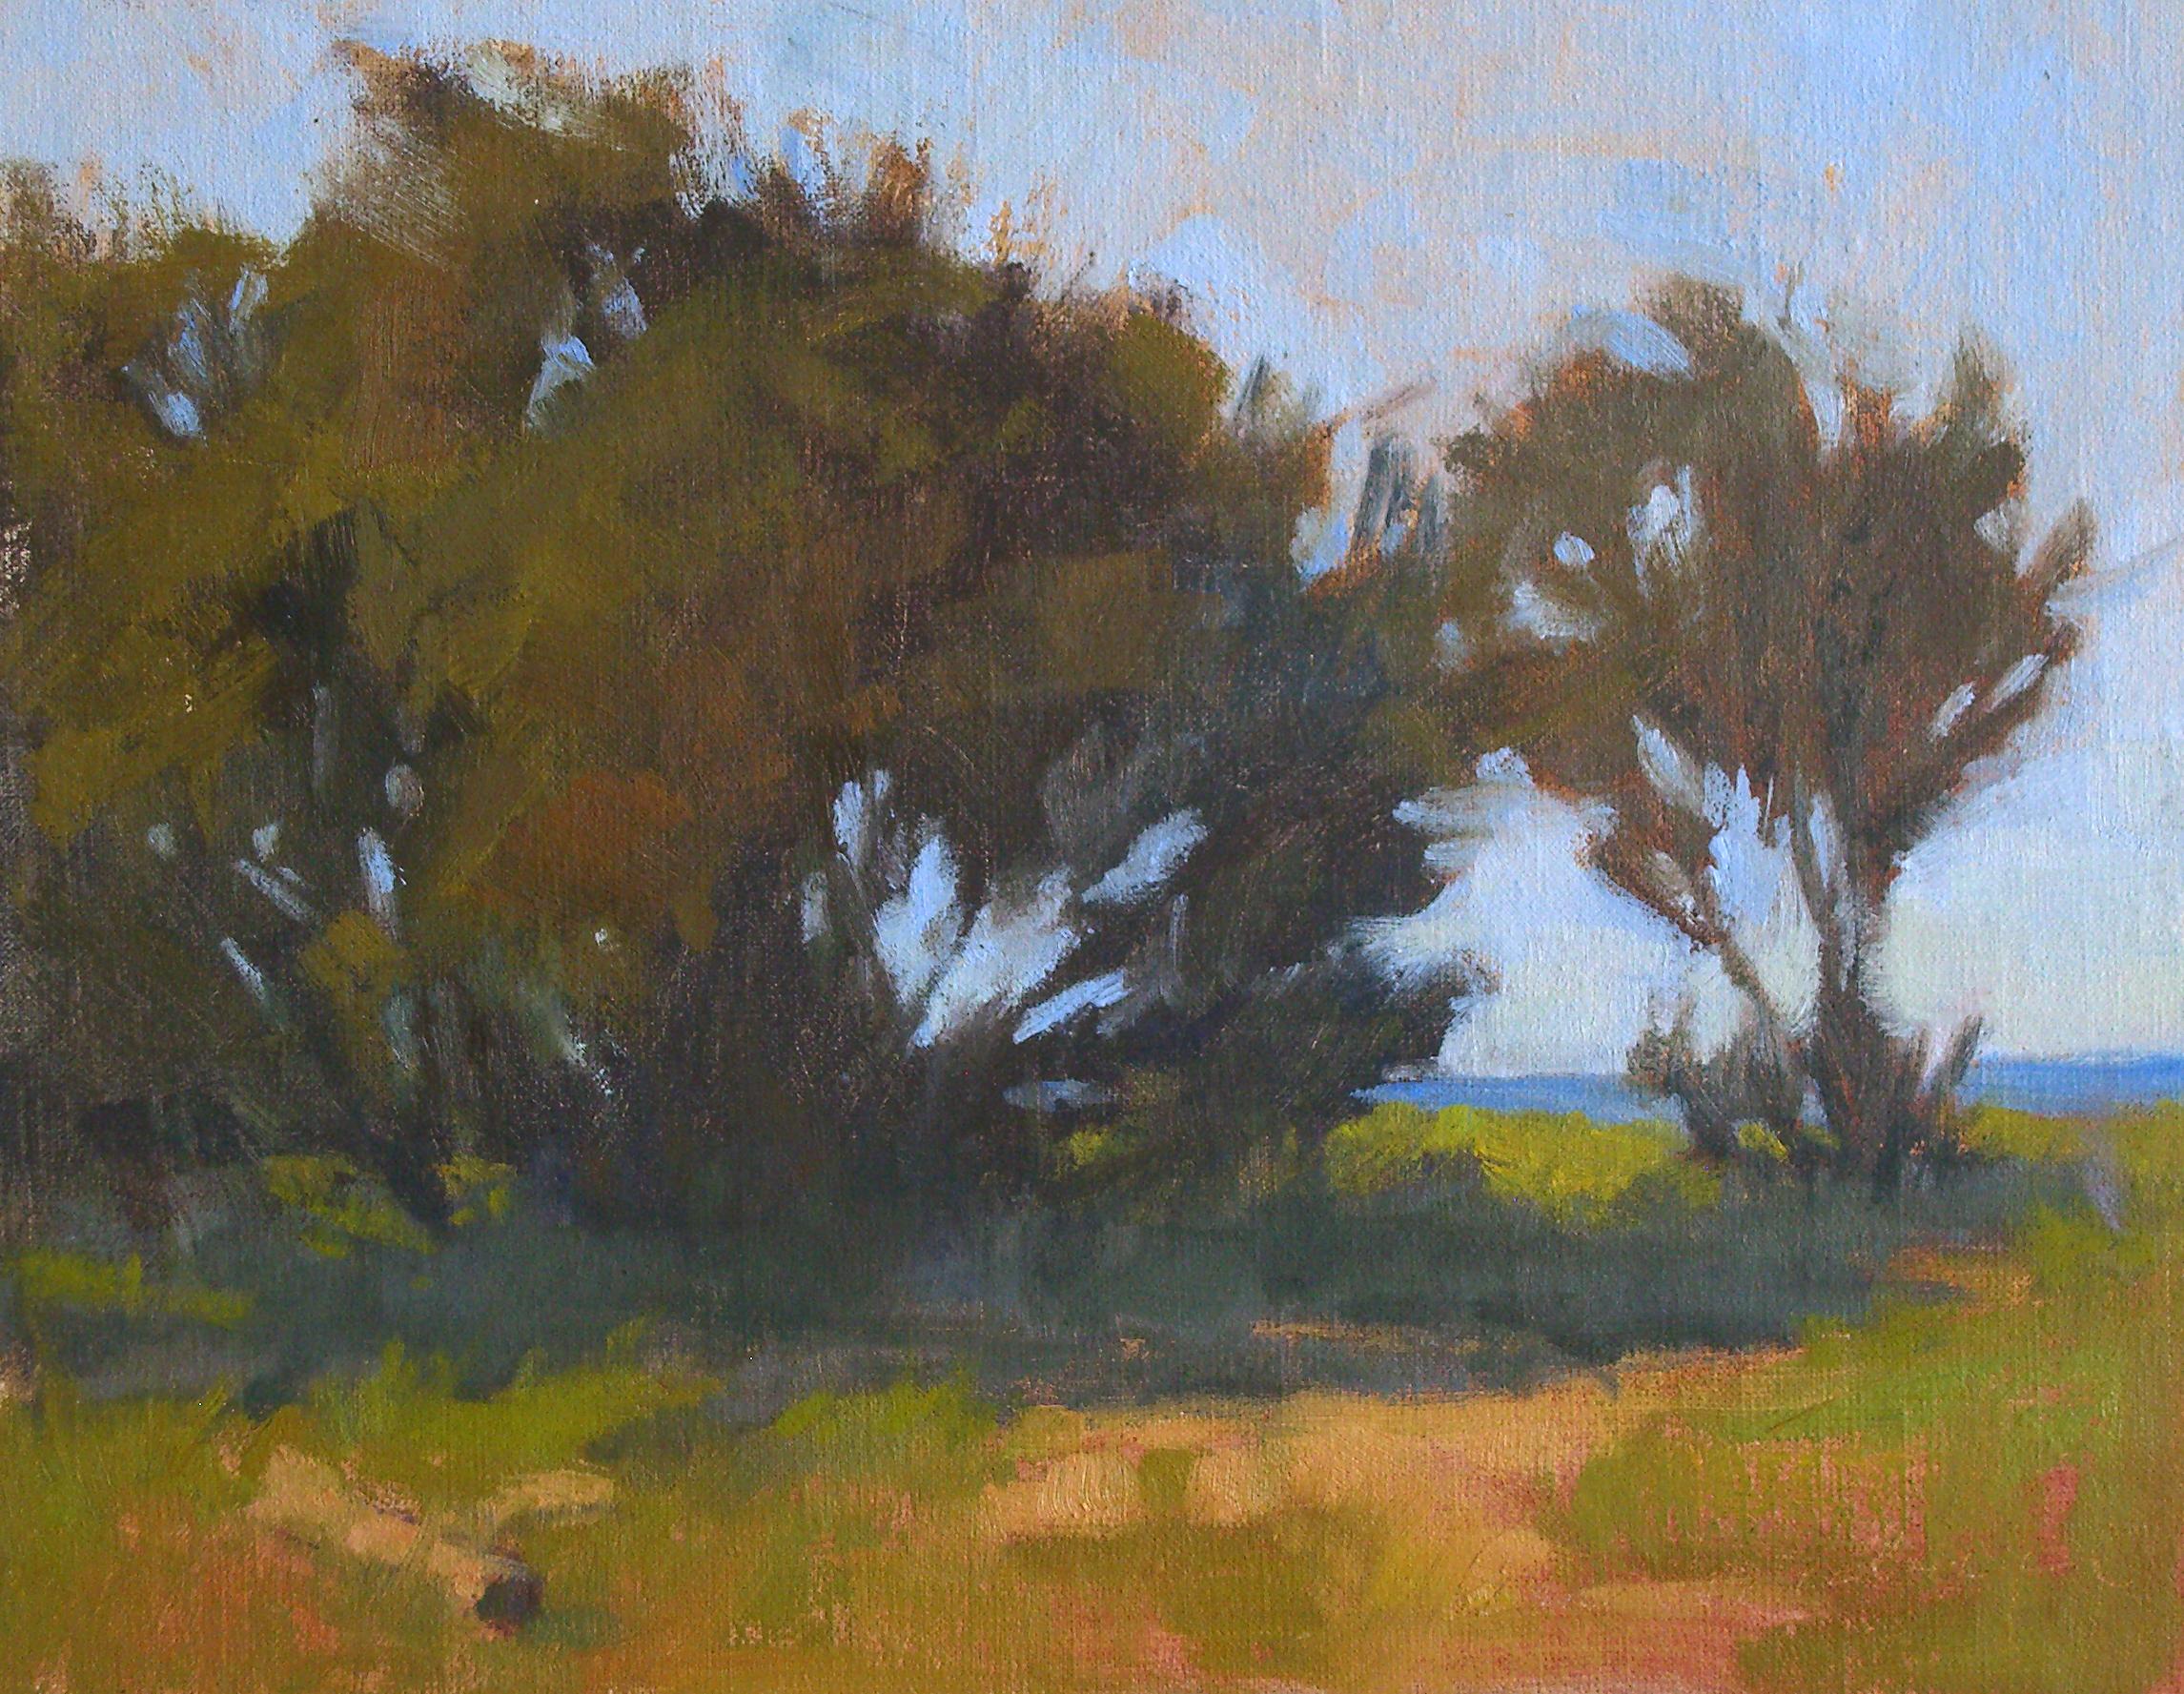 Ocean Glimpse, oil, 8x10